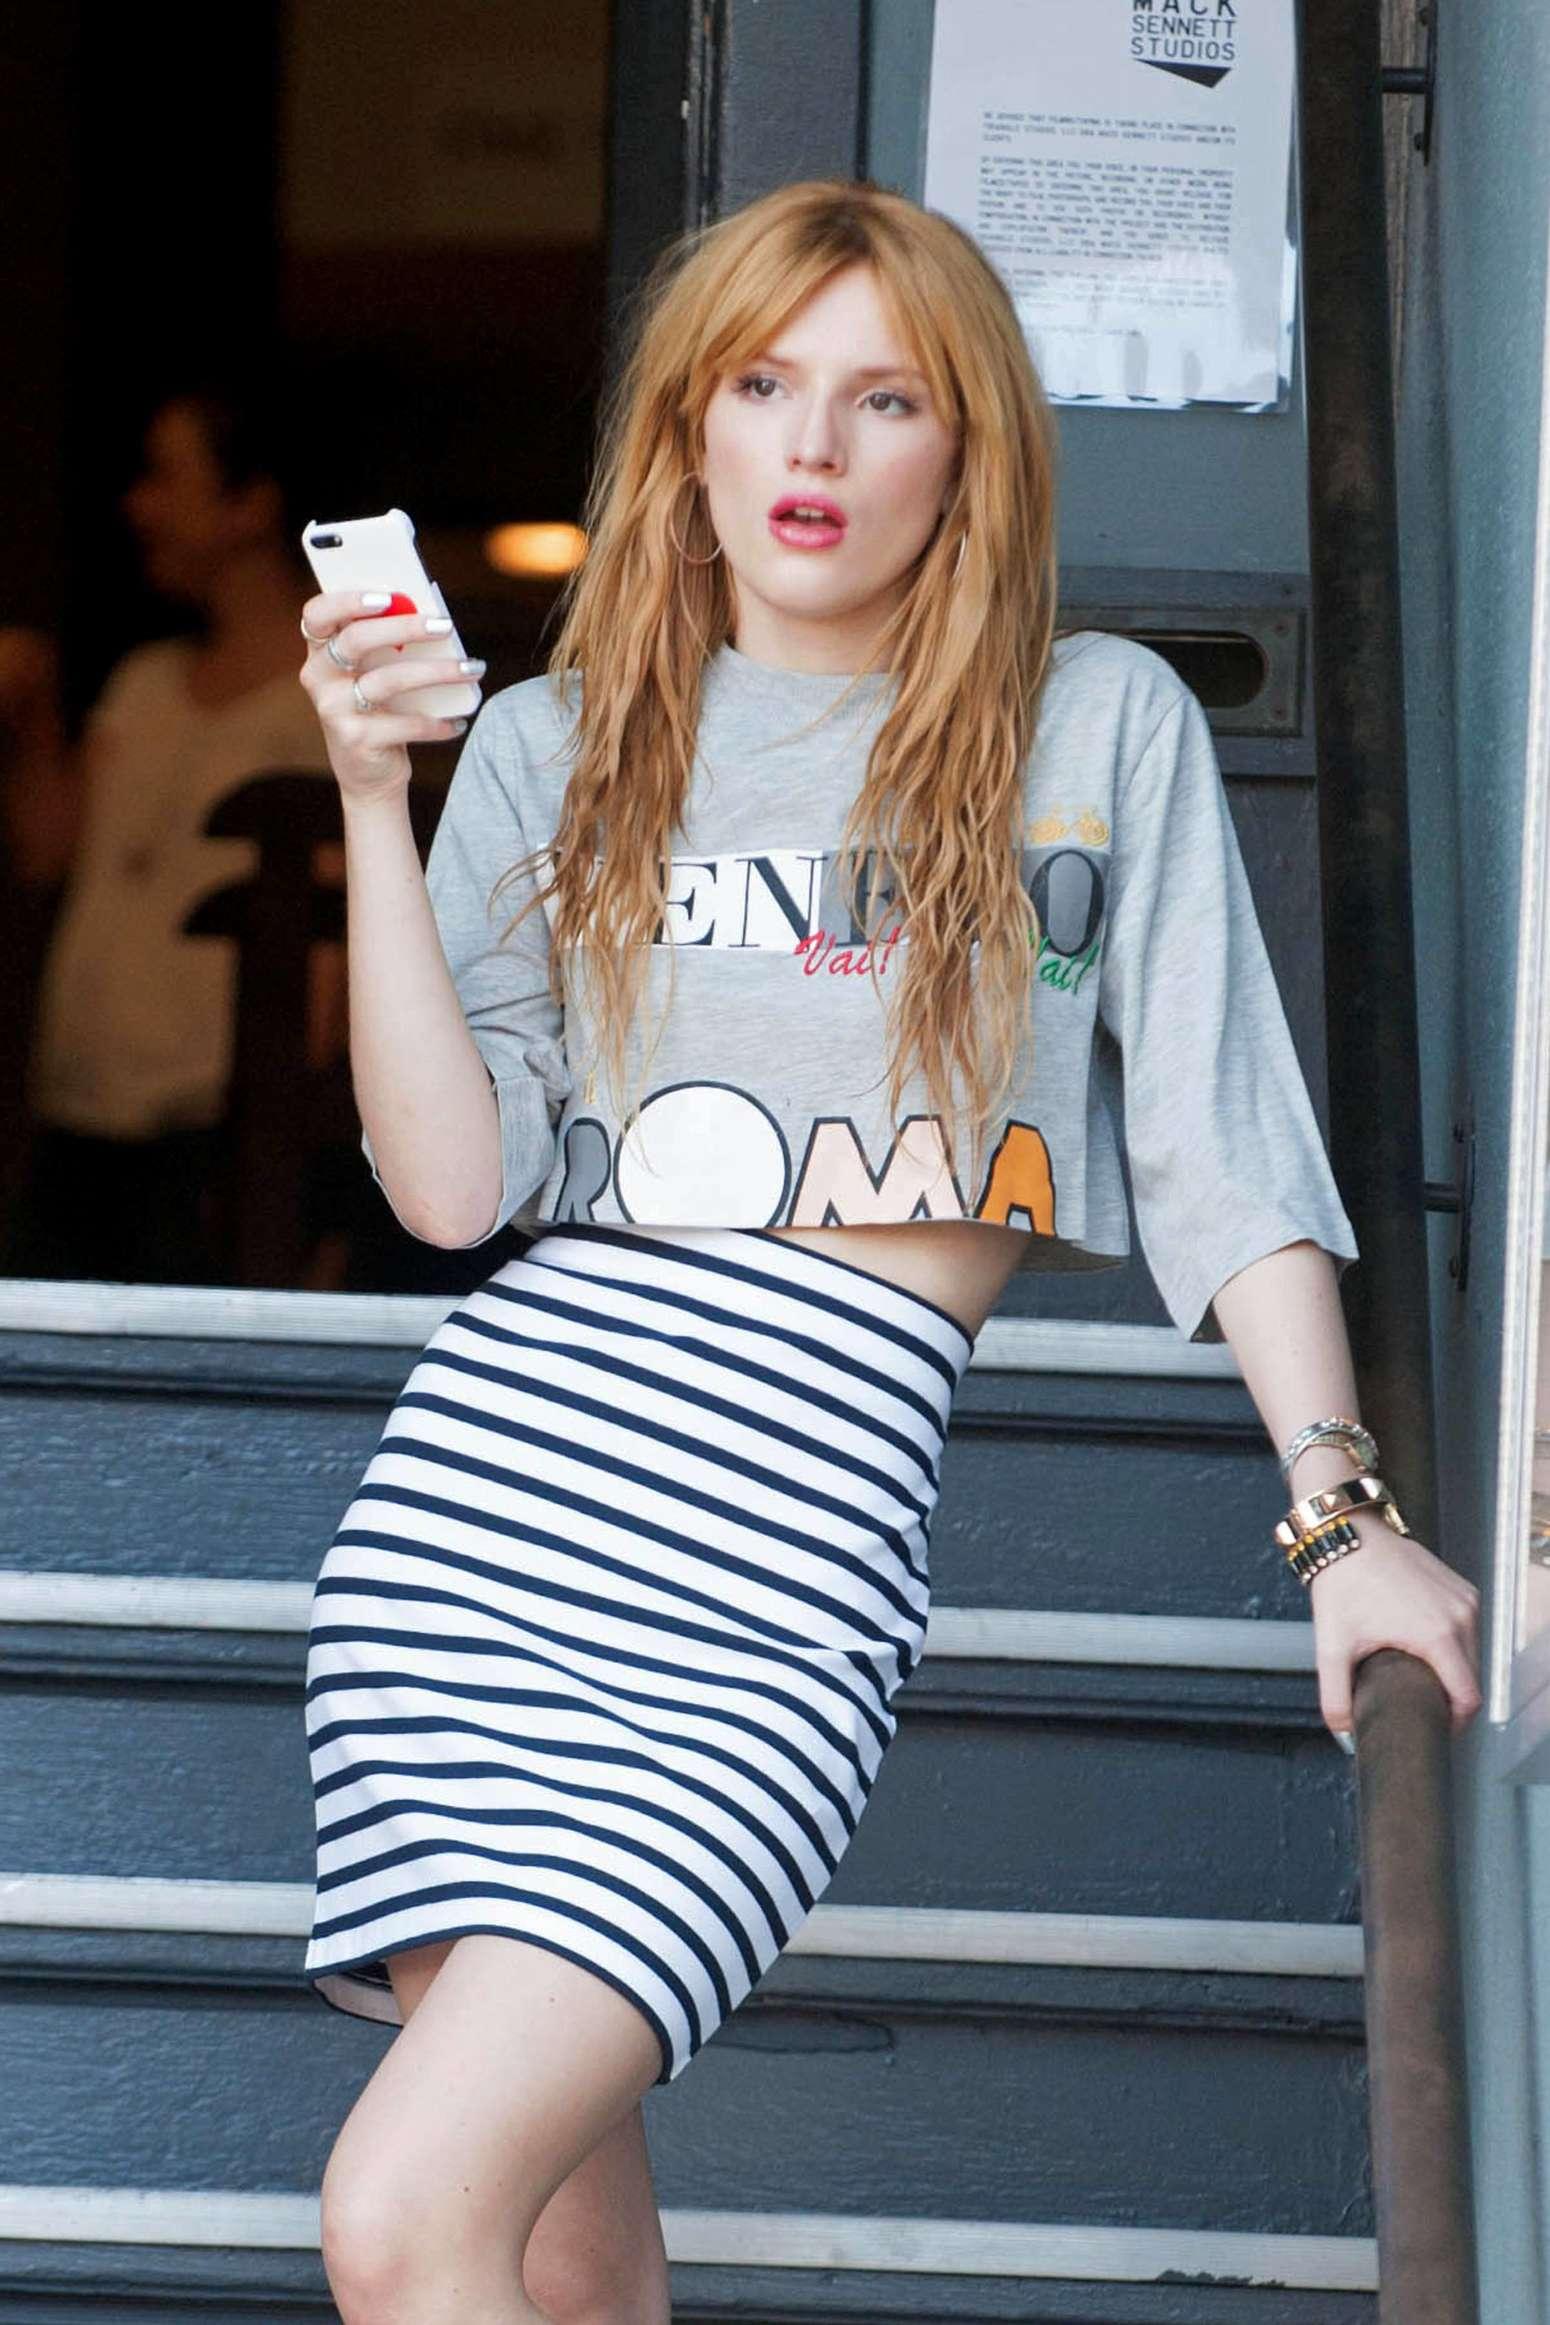 Bella Thorne 2014 : Bella Thorne Photos: 2014 Photoshoot in LA -17